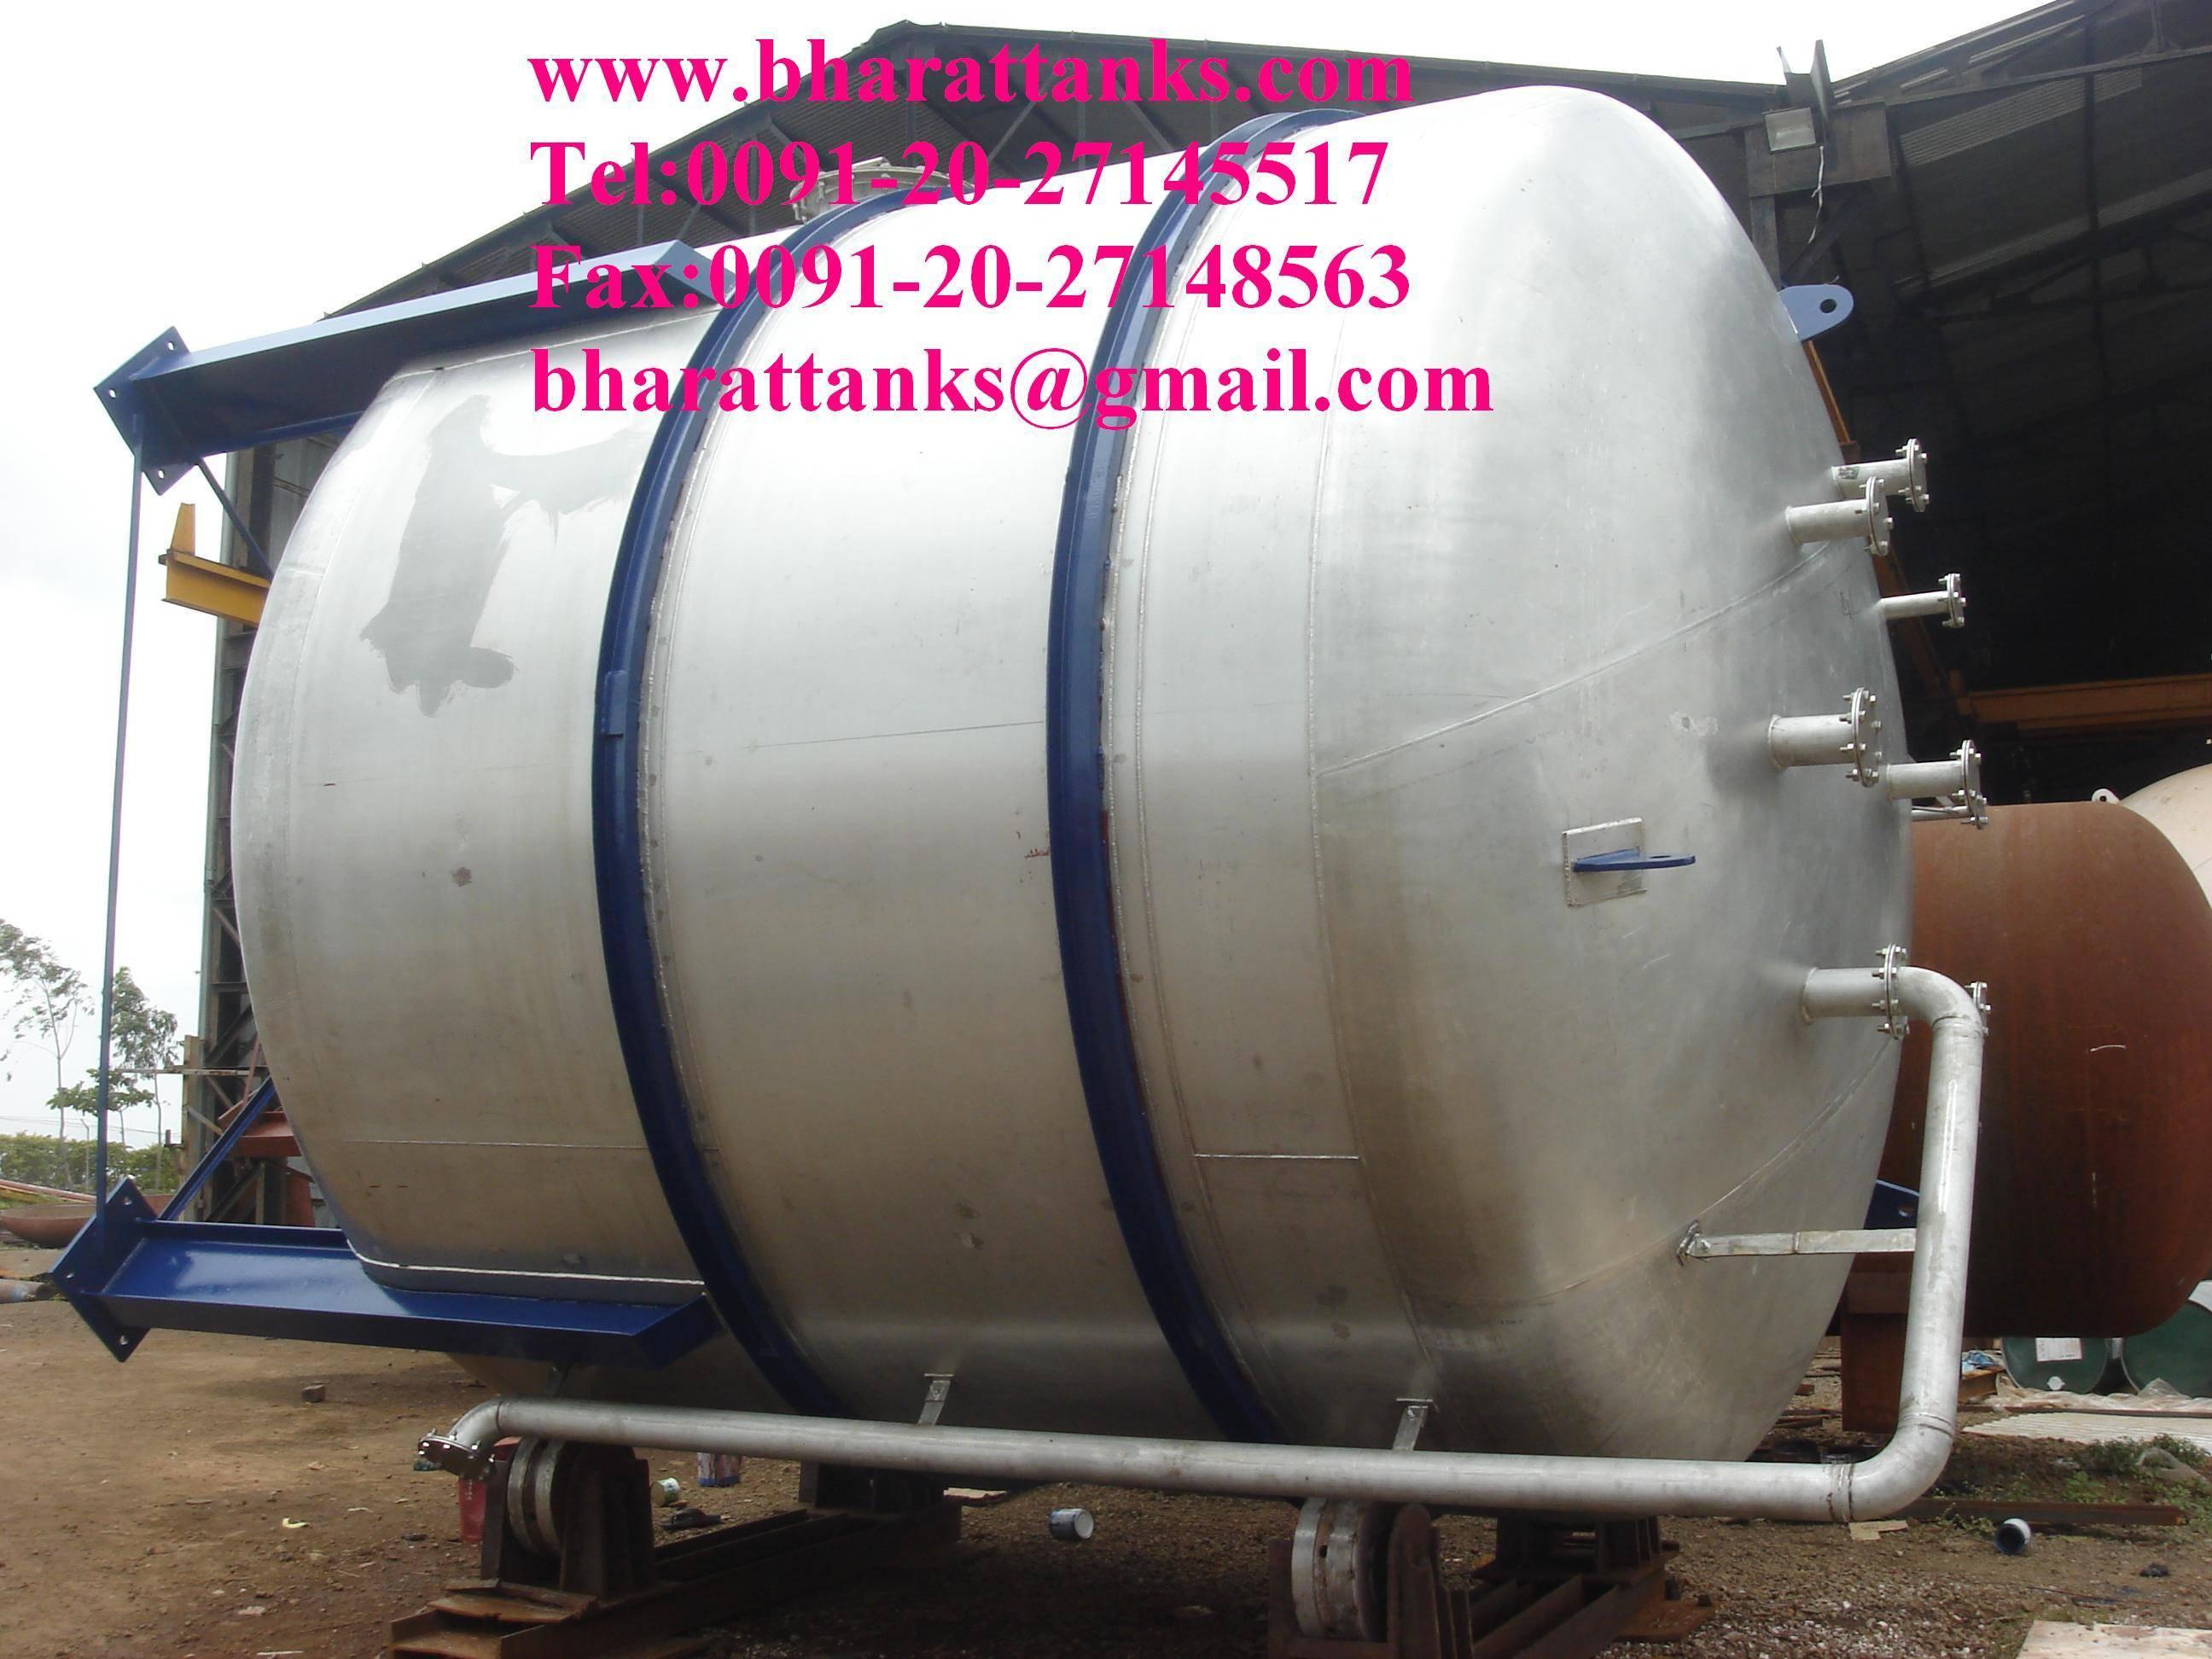 Ethanol gas storage tank